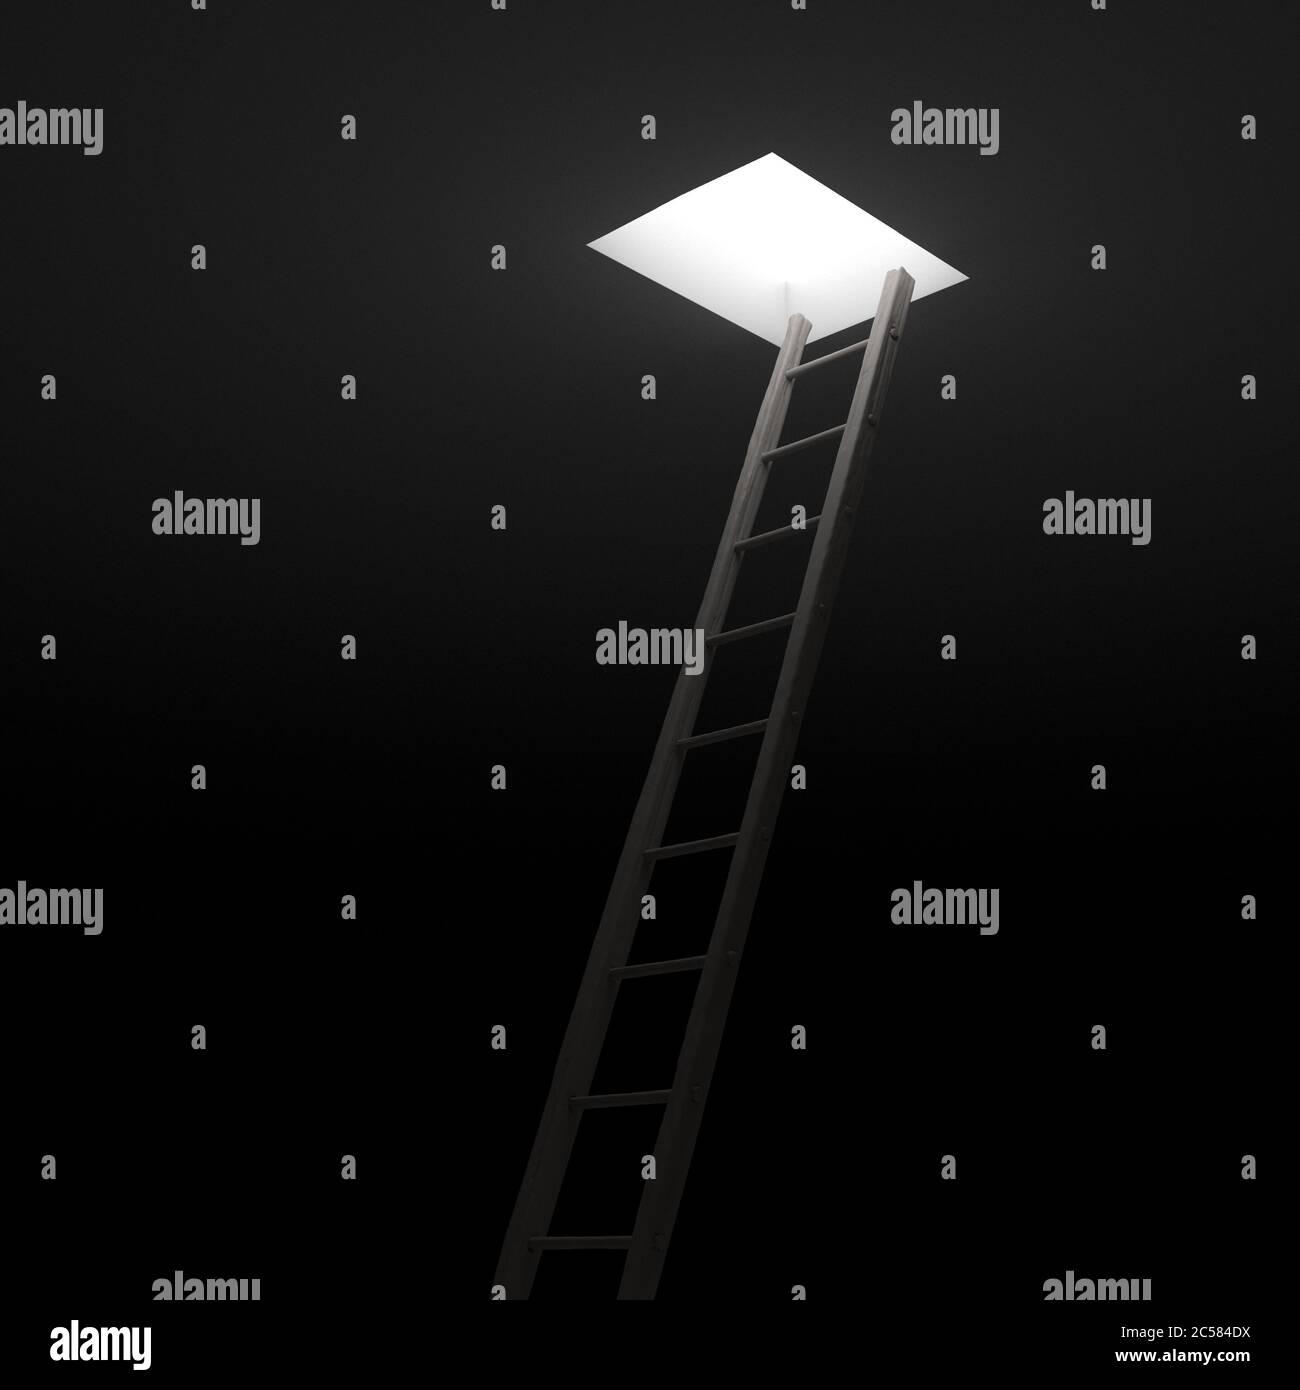 Escalera que conduce a la luz. Presentación 3d. Concepto de libertad. Foto de stock